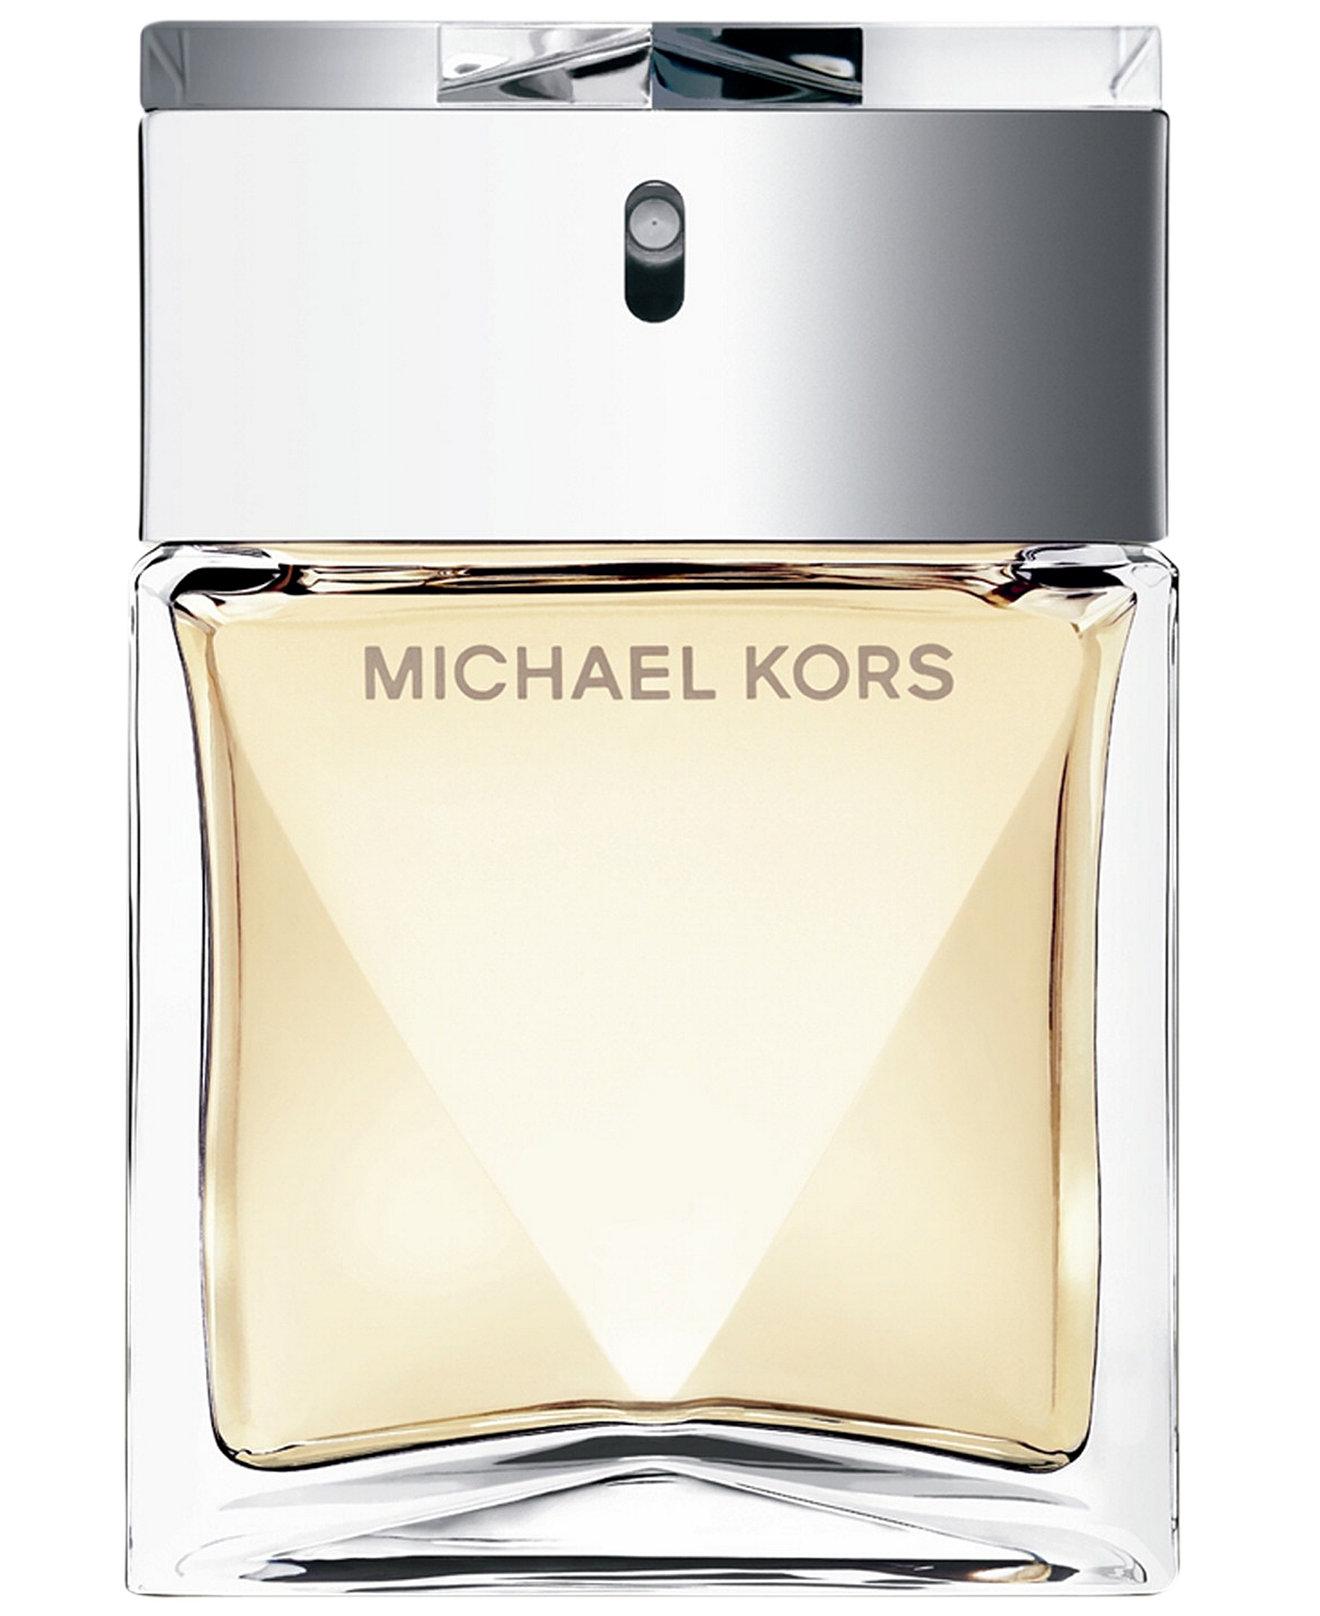 kourtney kardashian favorite perfume michael by michael kors. Black Bedroom Furniture Sets. Home Design Ideas